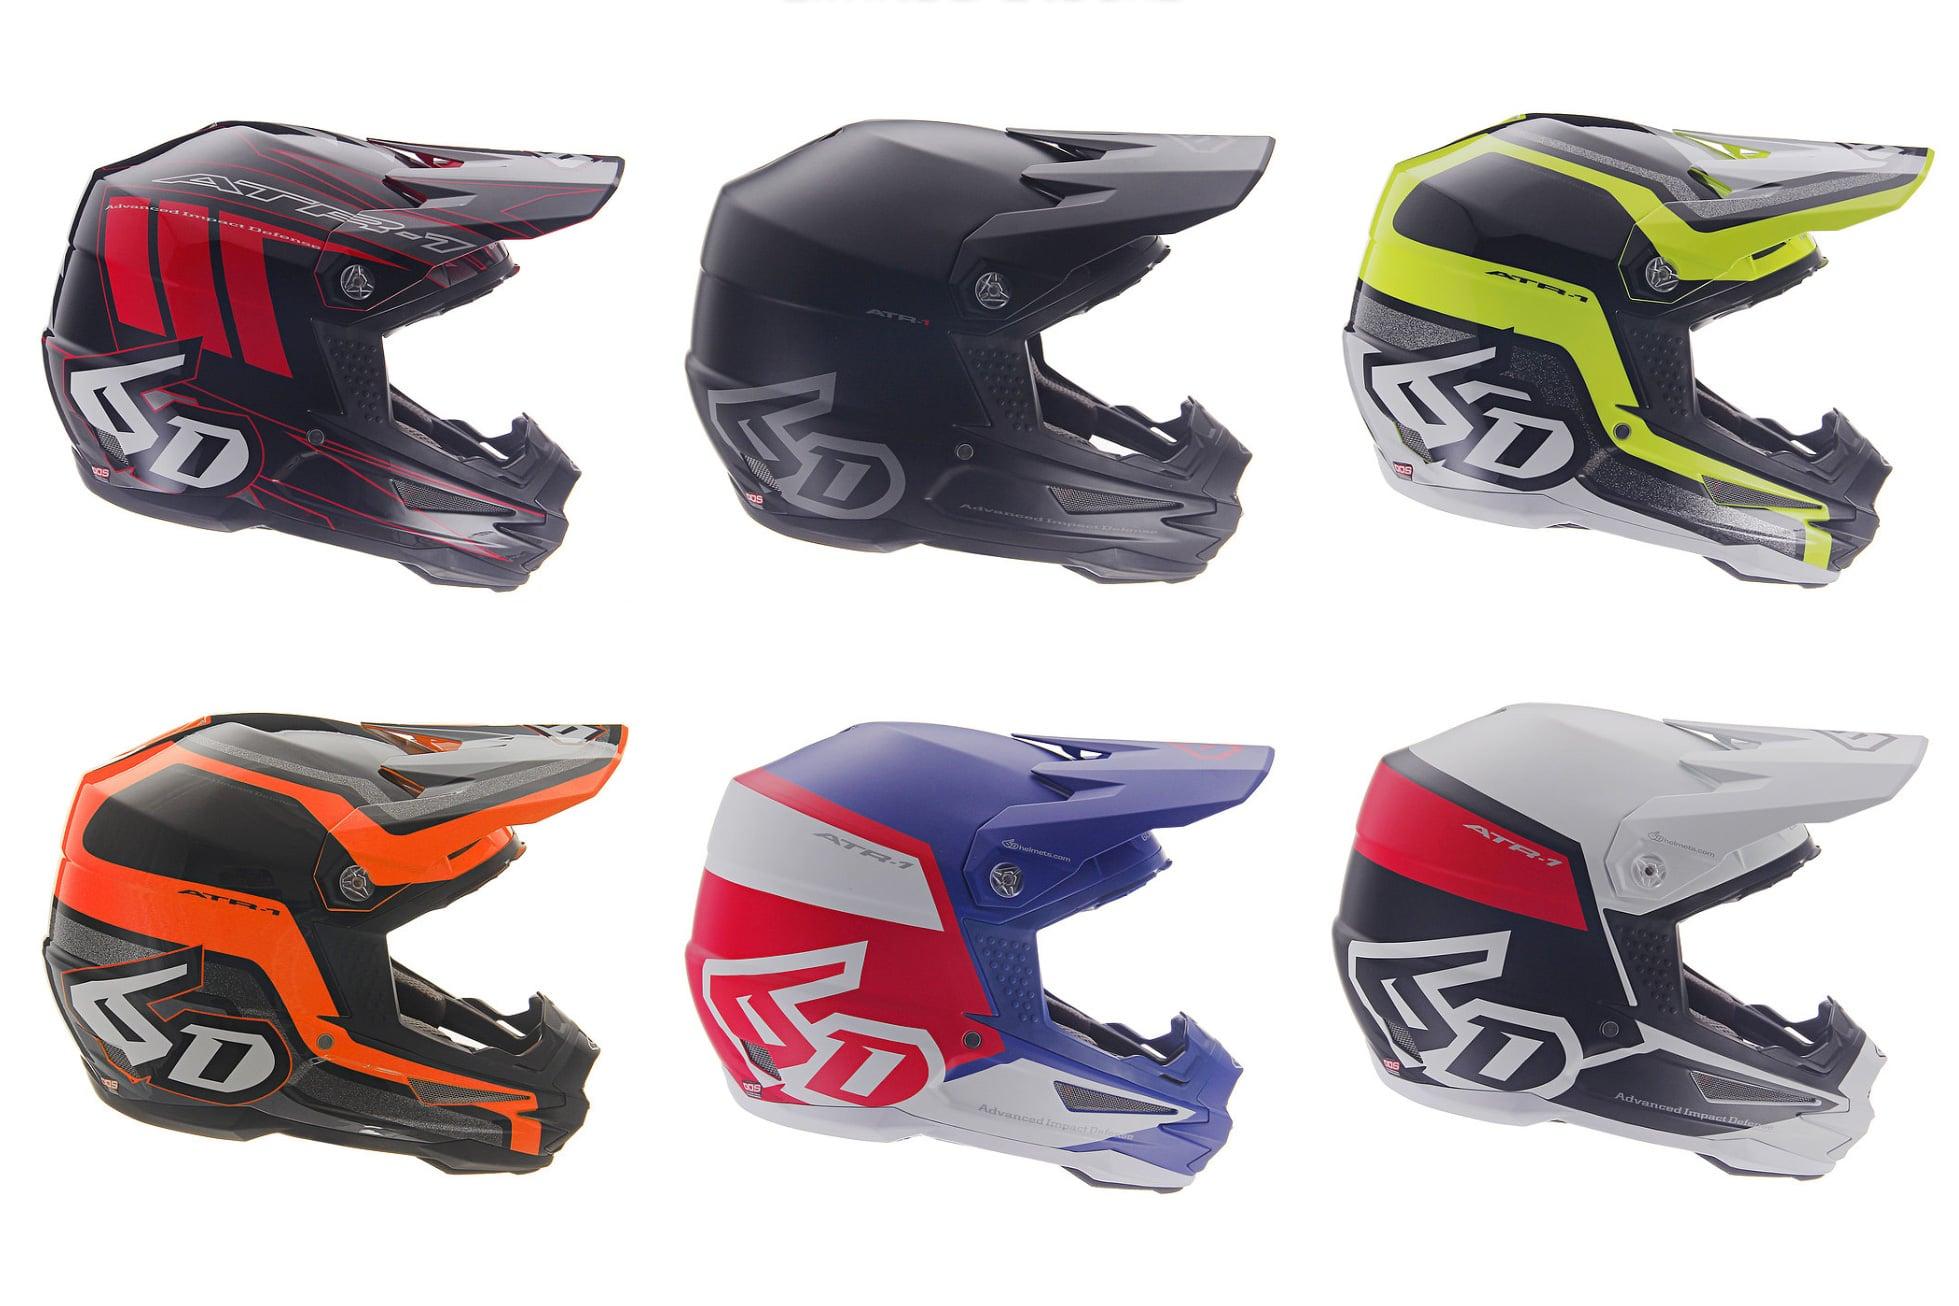 Guide cadeaux de noël 2020 édition motocross & VTT